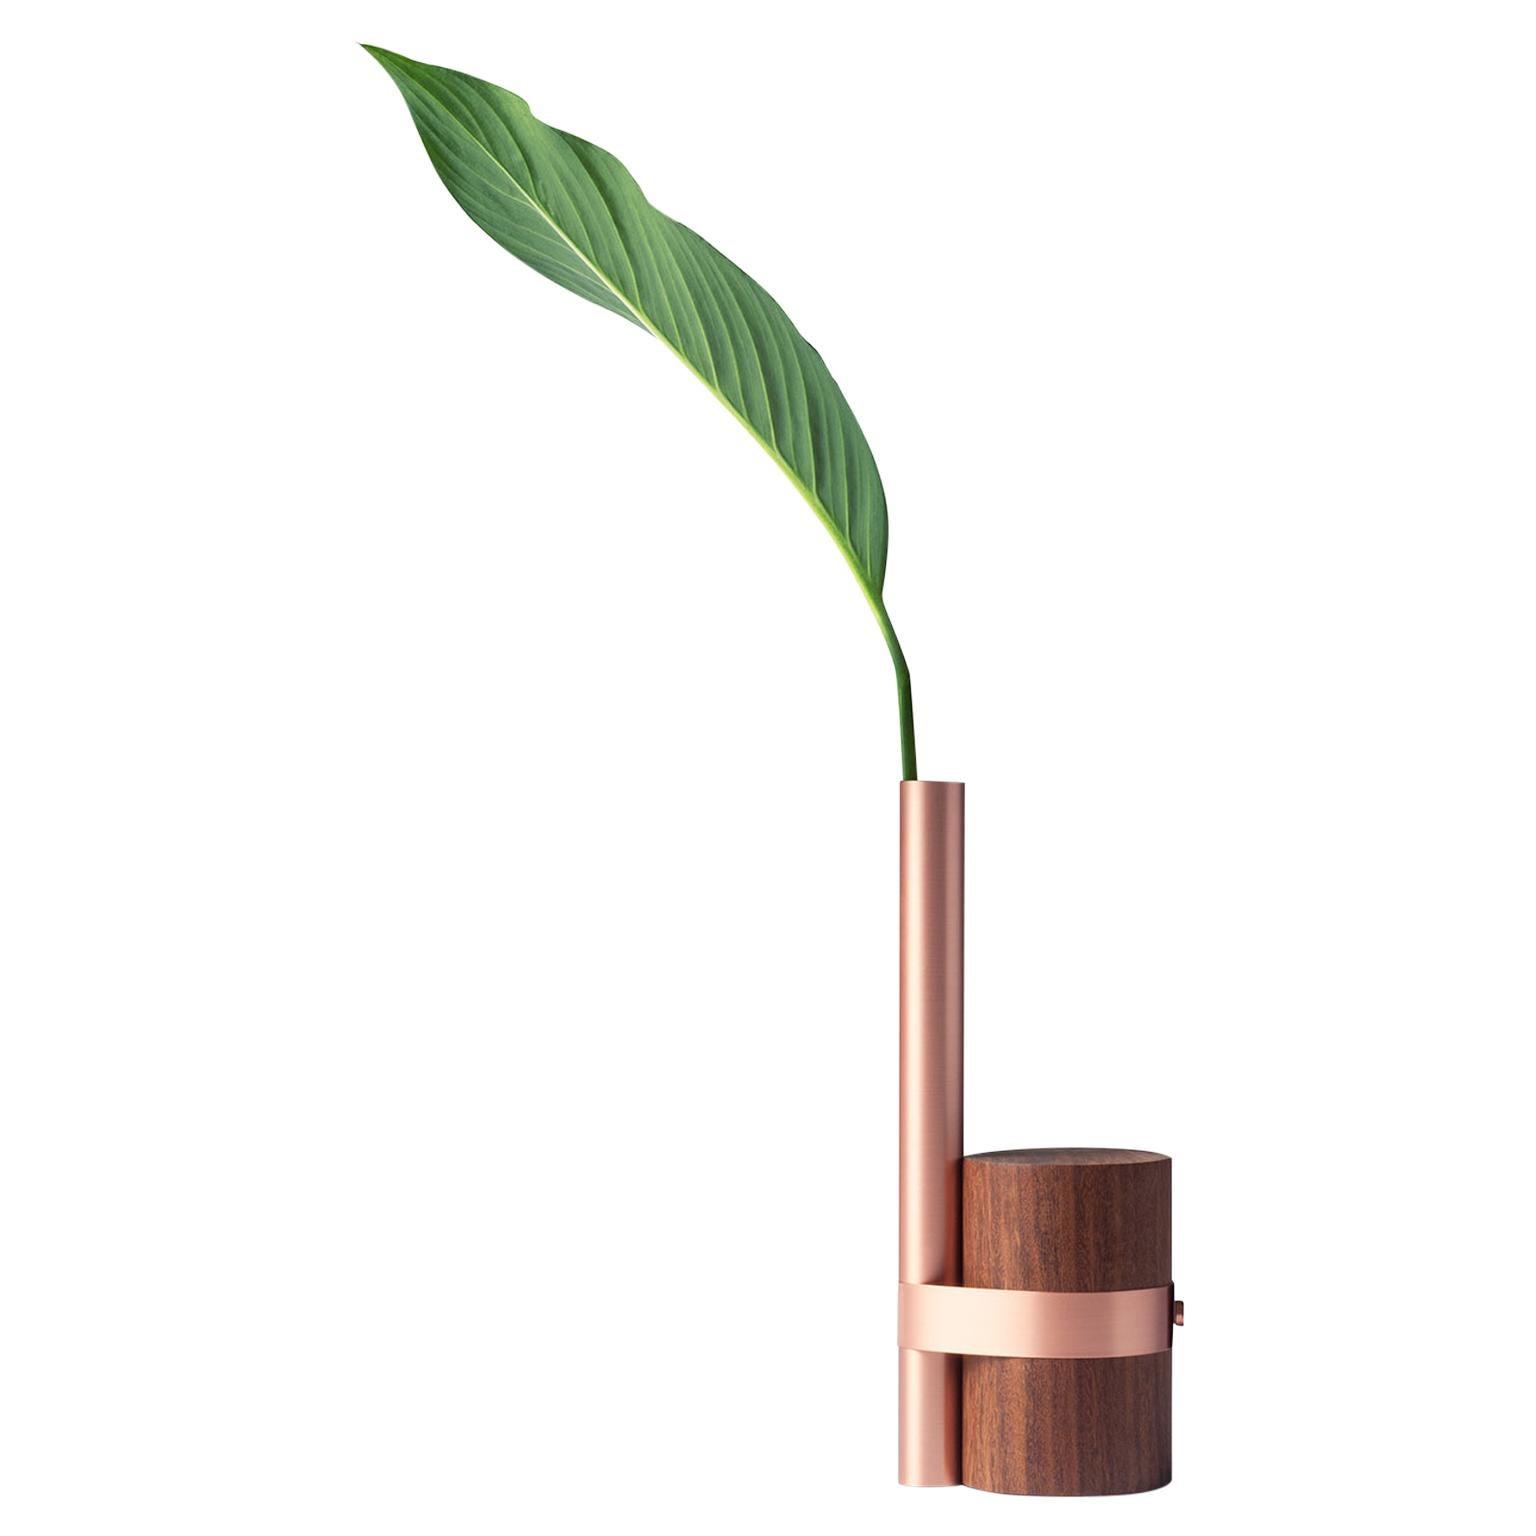 Post-Tropical Vase in Copper by Wentz, Brazilian Contemporary Design